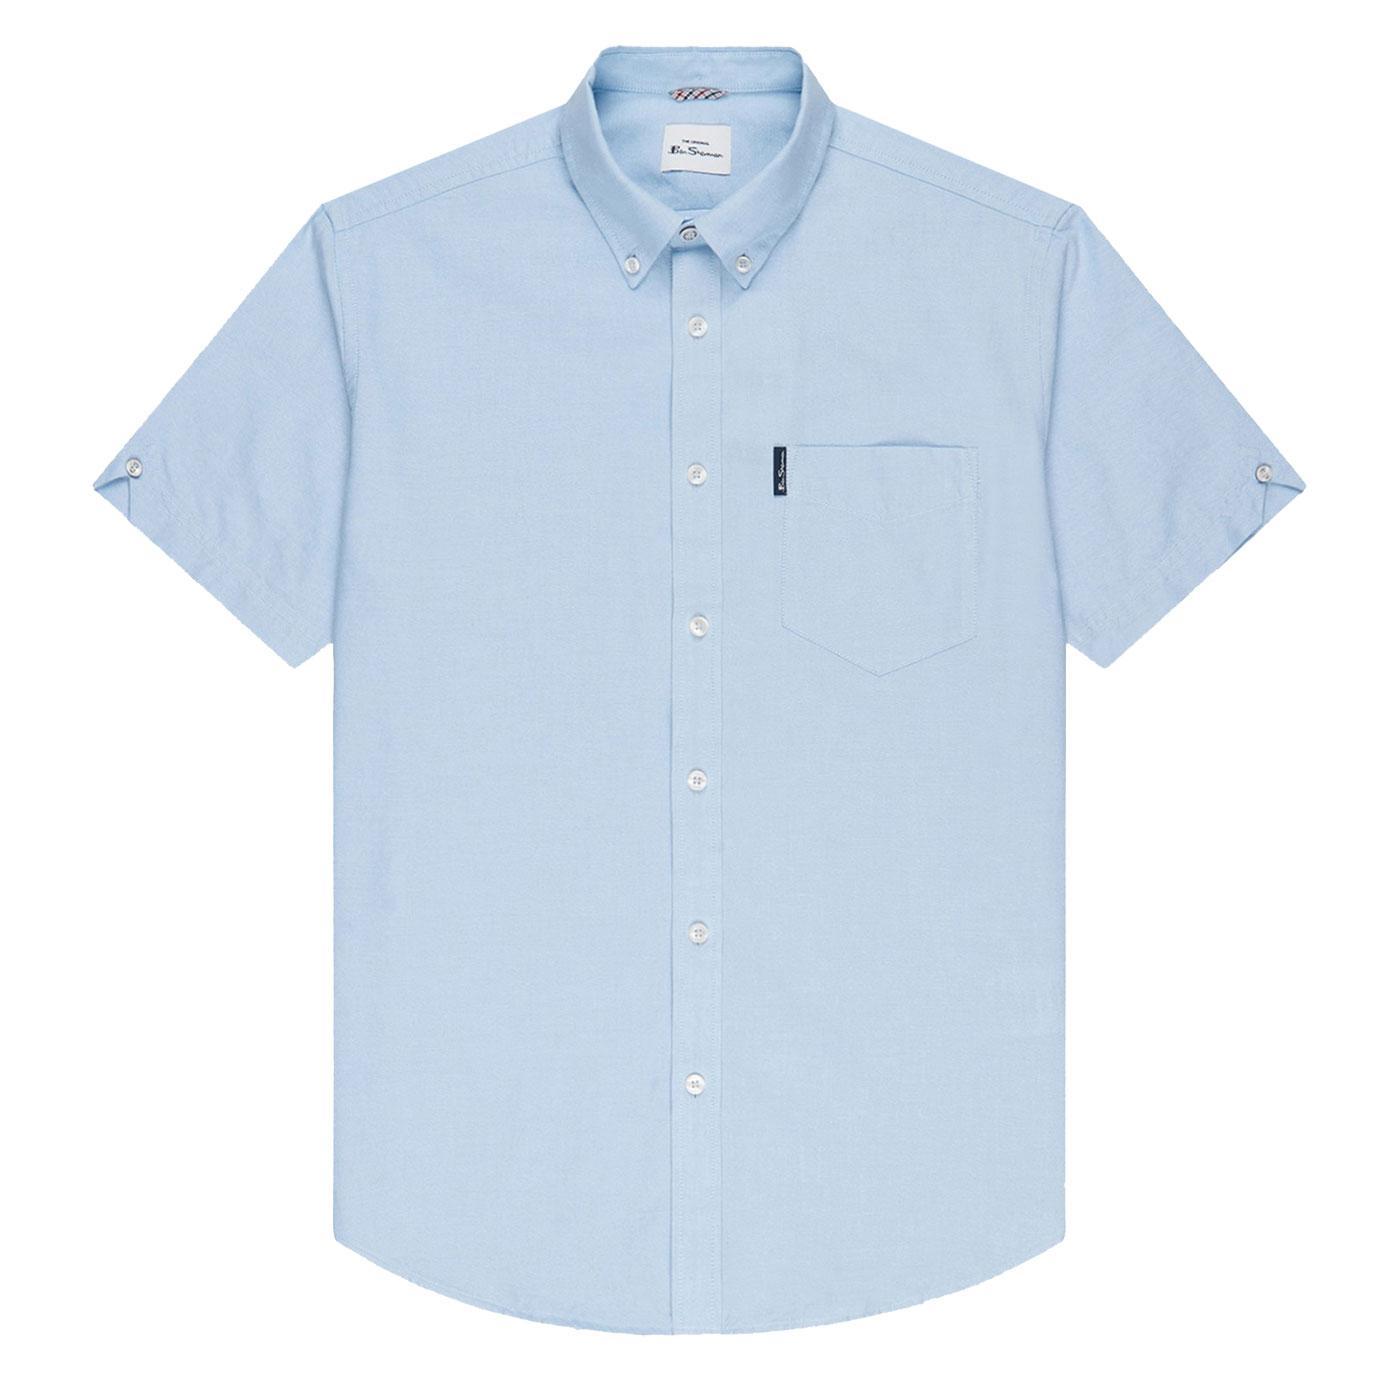 BEN SHERMAN Retro Short Sleeve Oxford Shirt - SKY